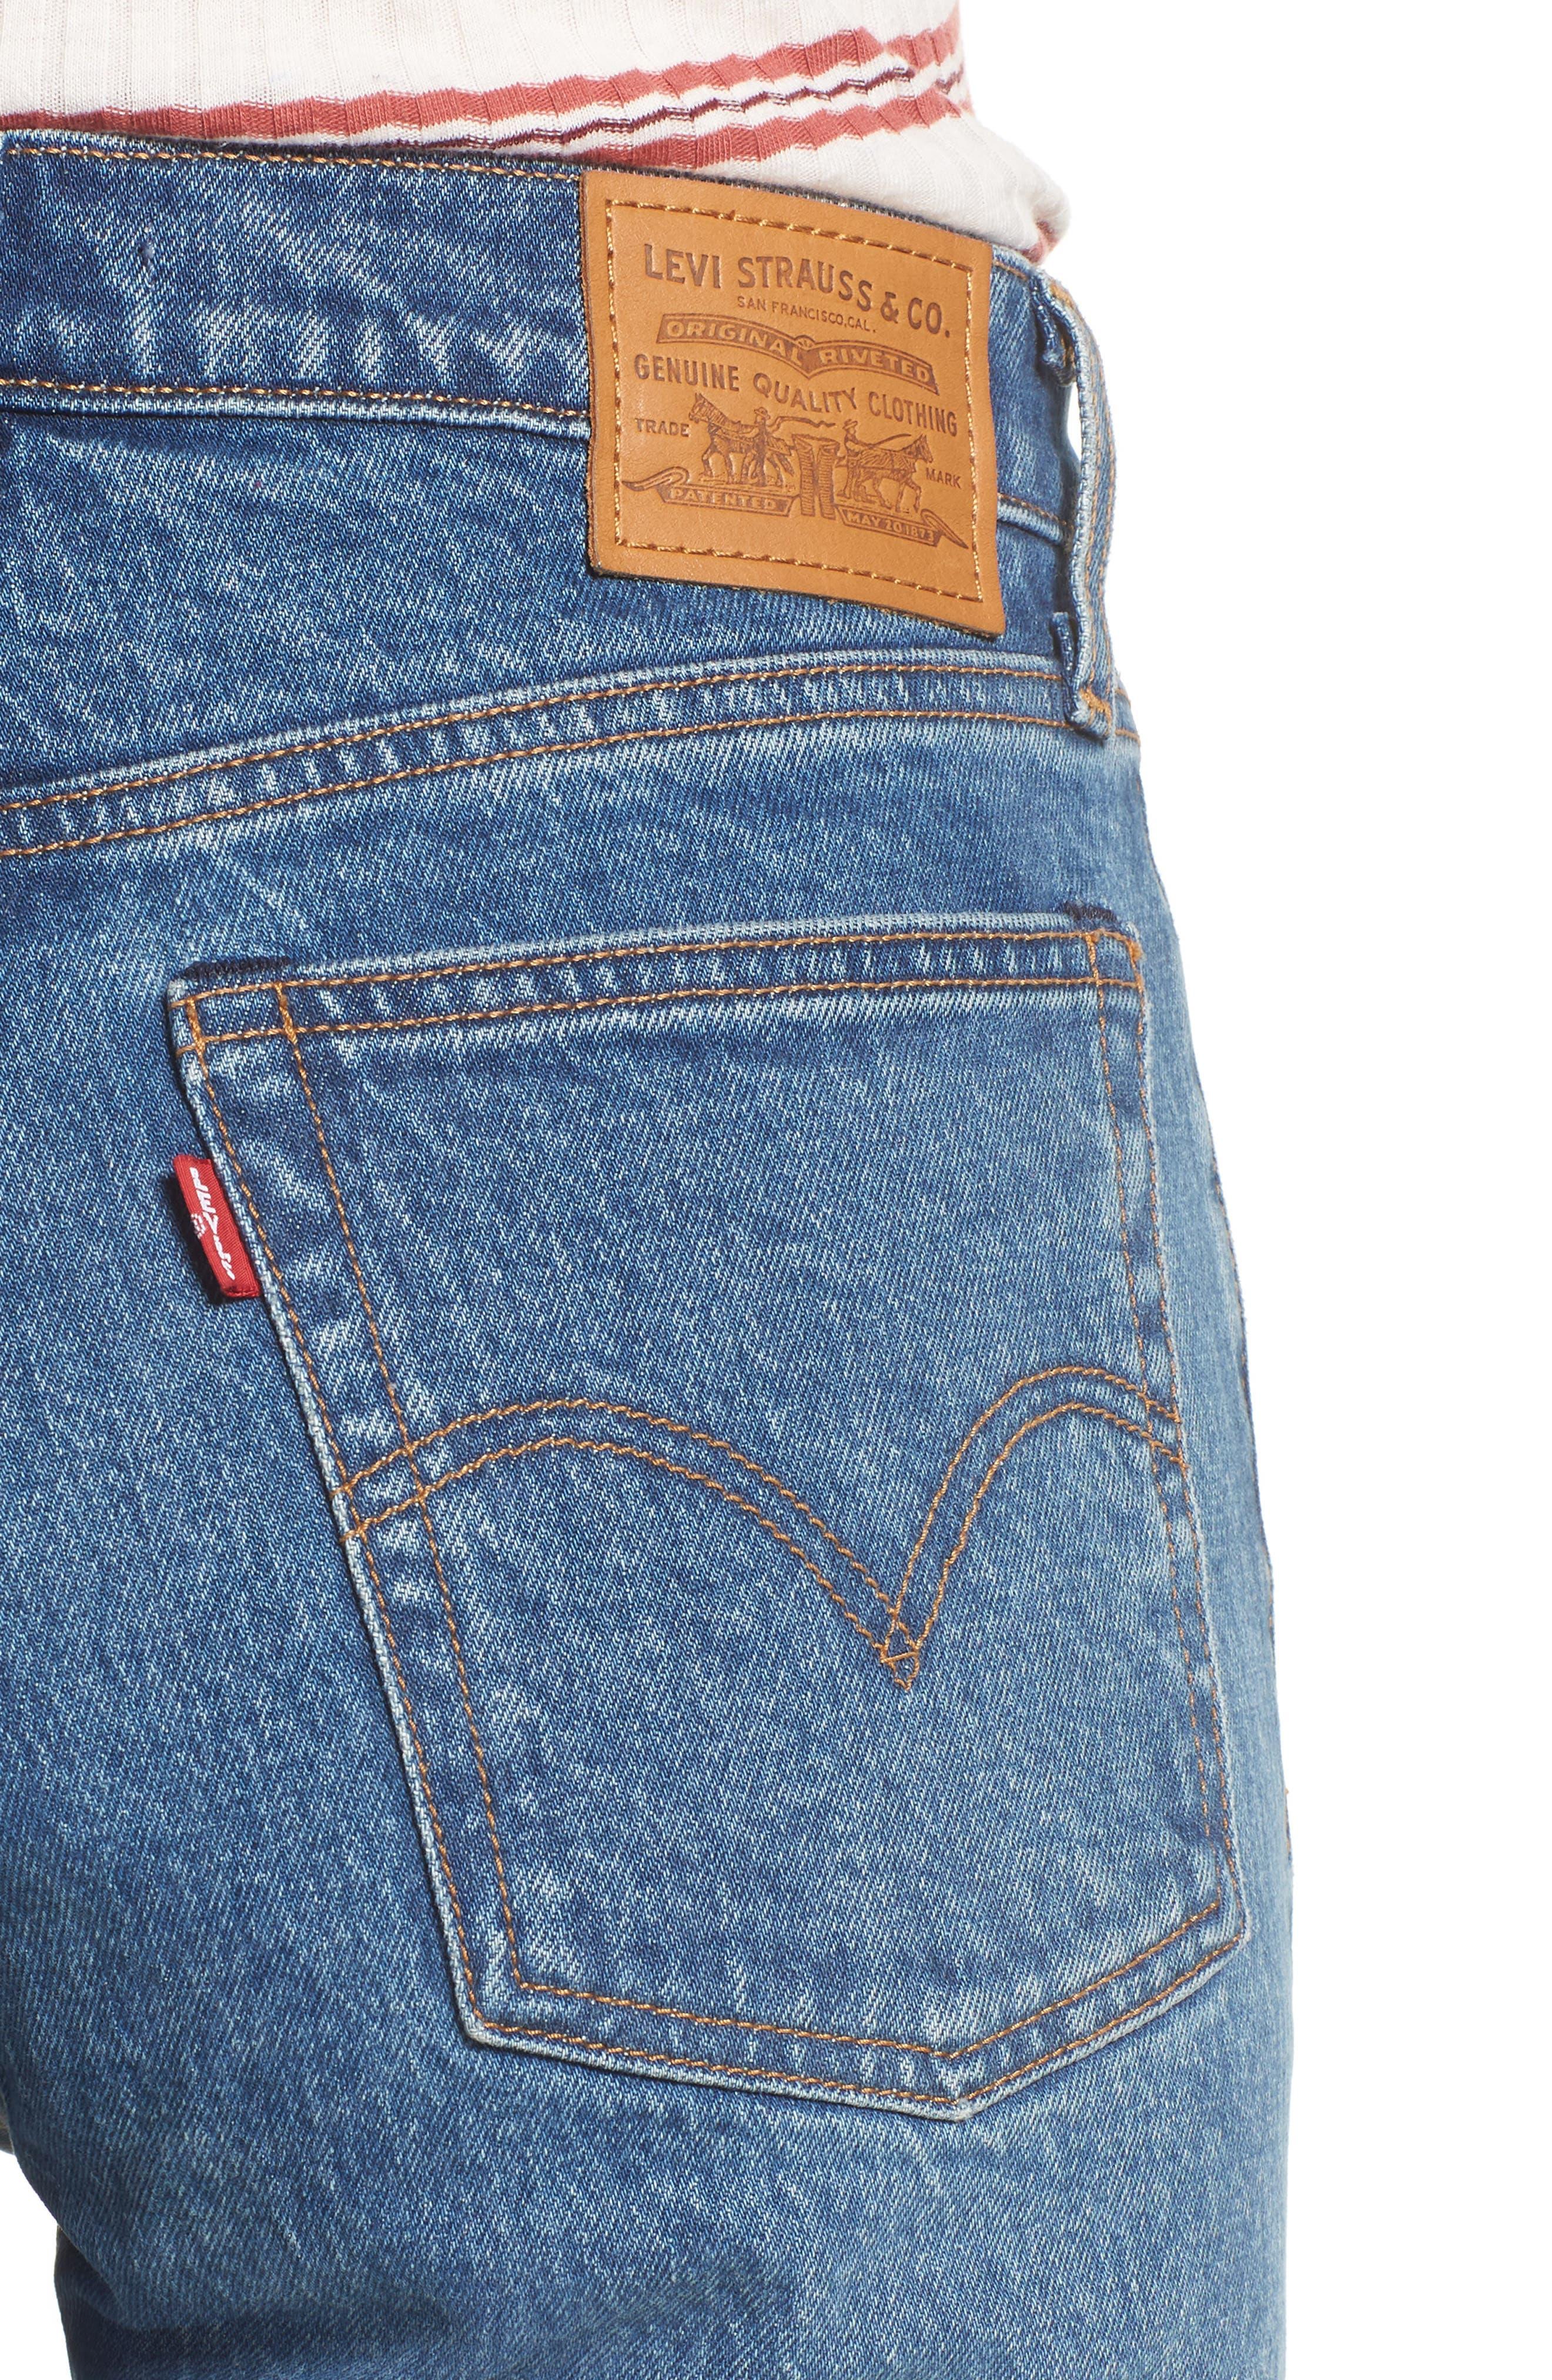 LEVI'S<SUP>®</SUP>, Wedgie Raw Hem High Waist Straight Leg Jeans, Alternate thumbnail 5, color, LOVE TRIANGLE